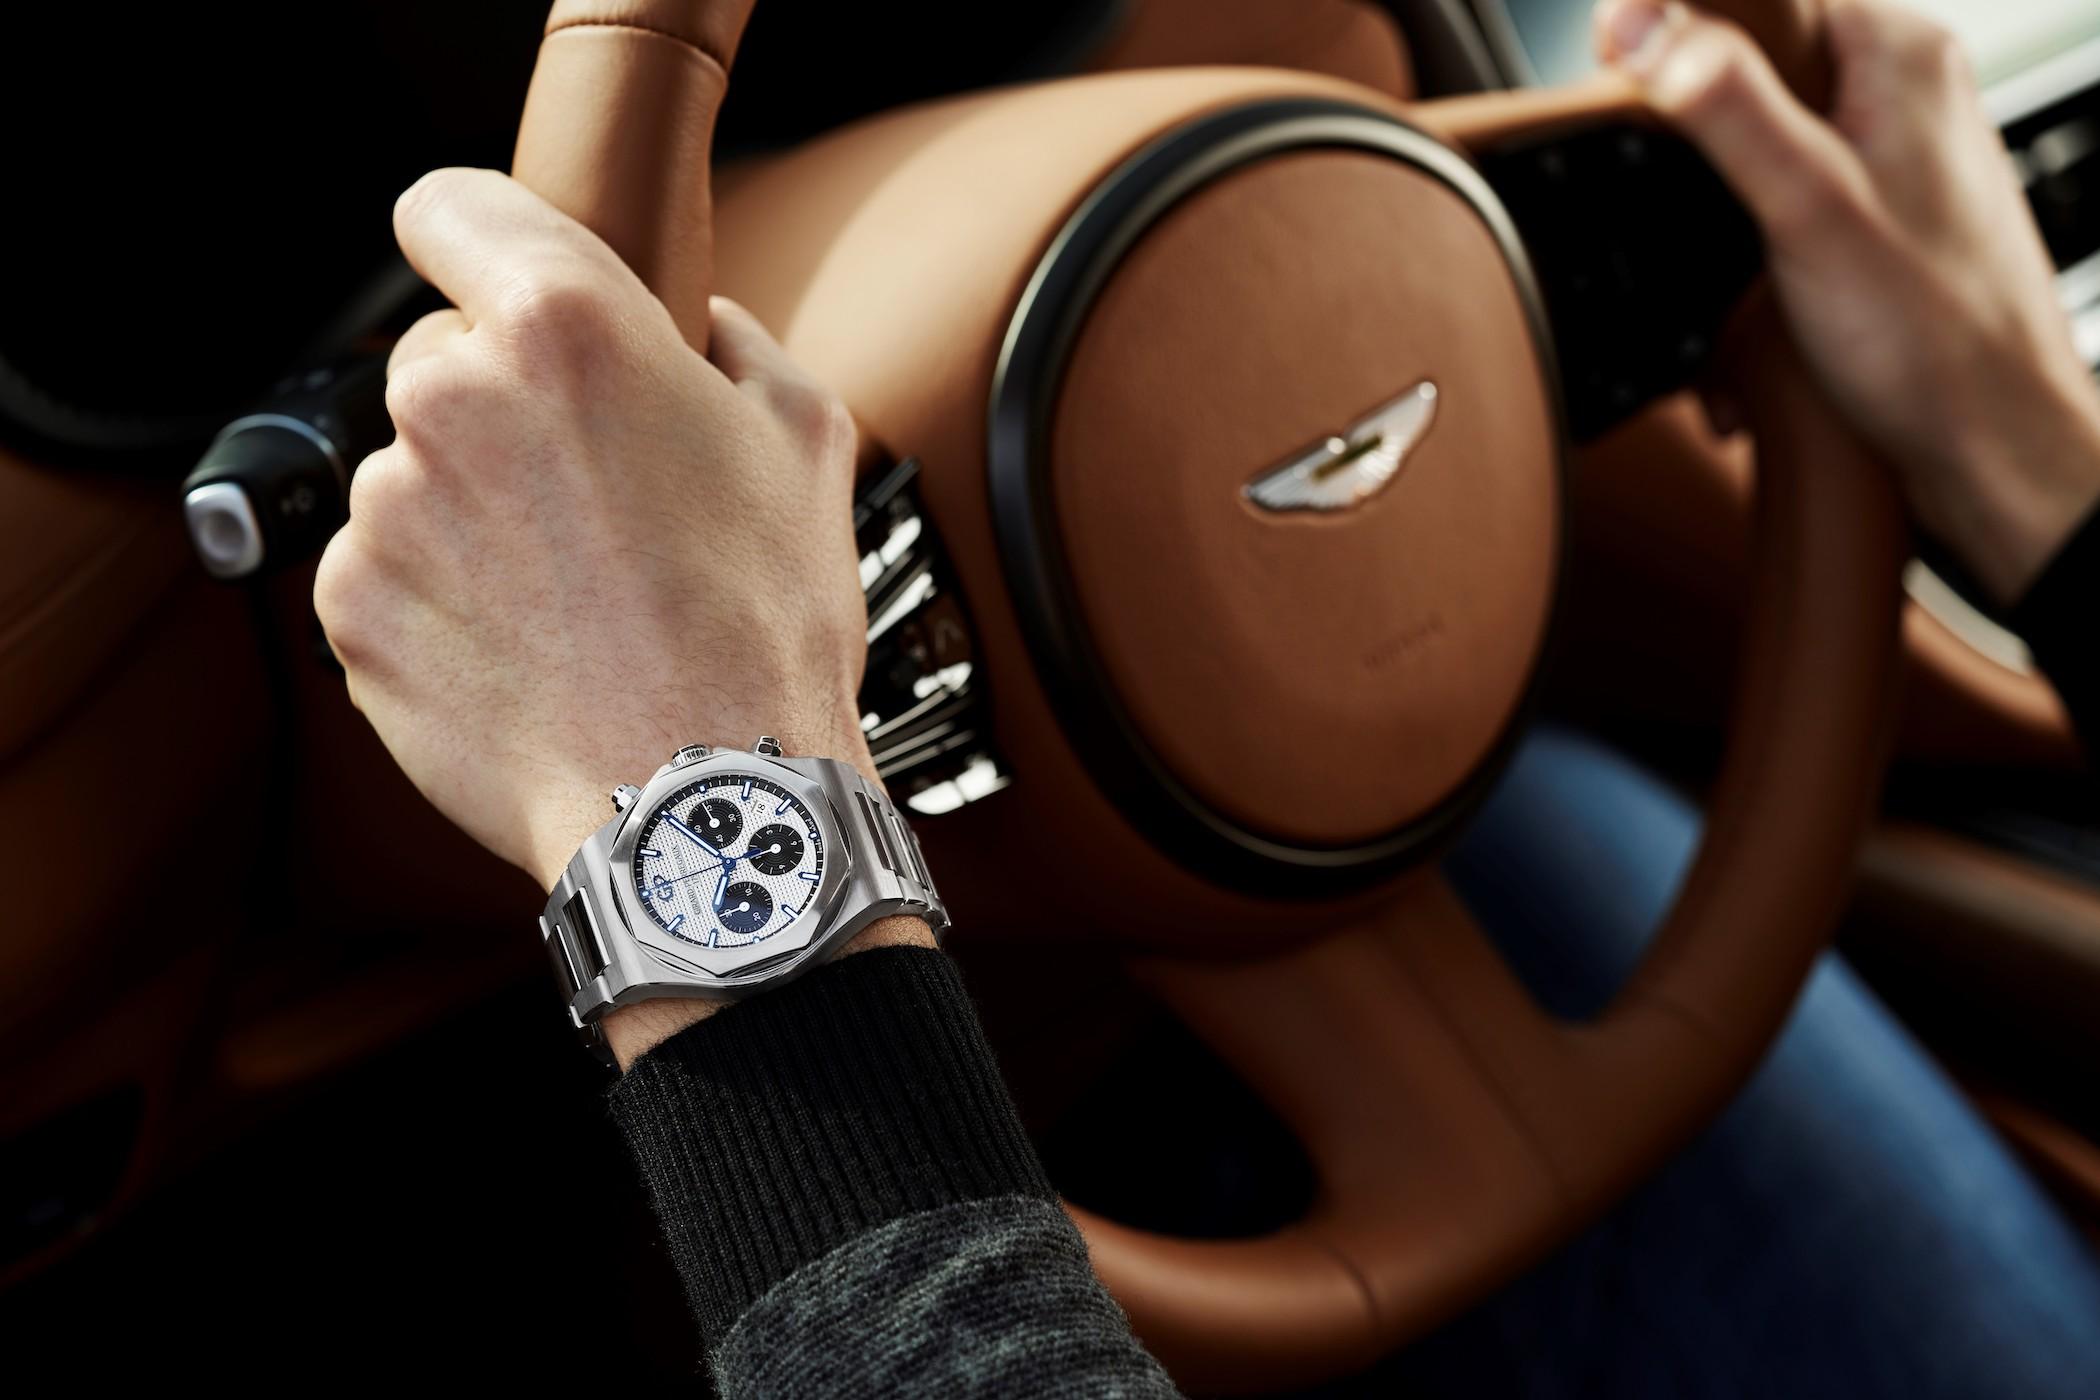 Girard-Perregaux x Aston Martin Partnership